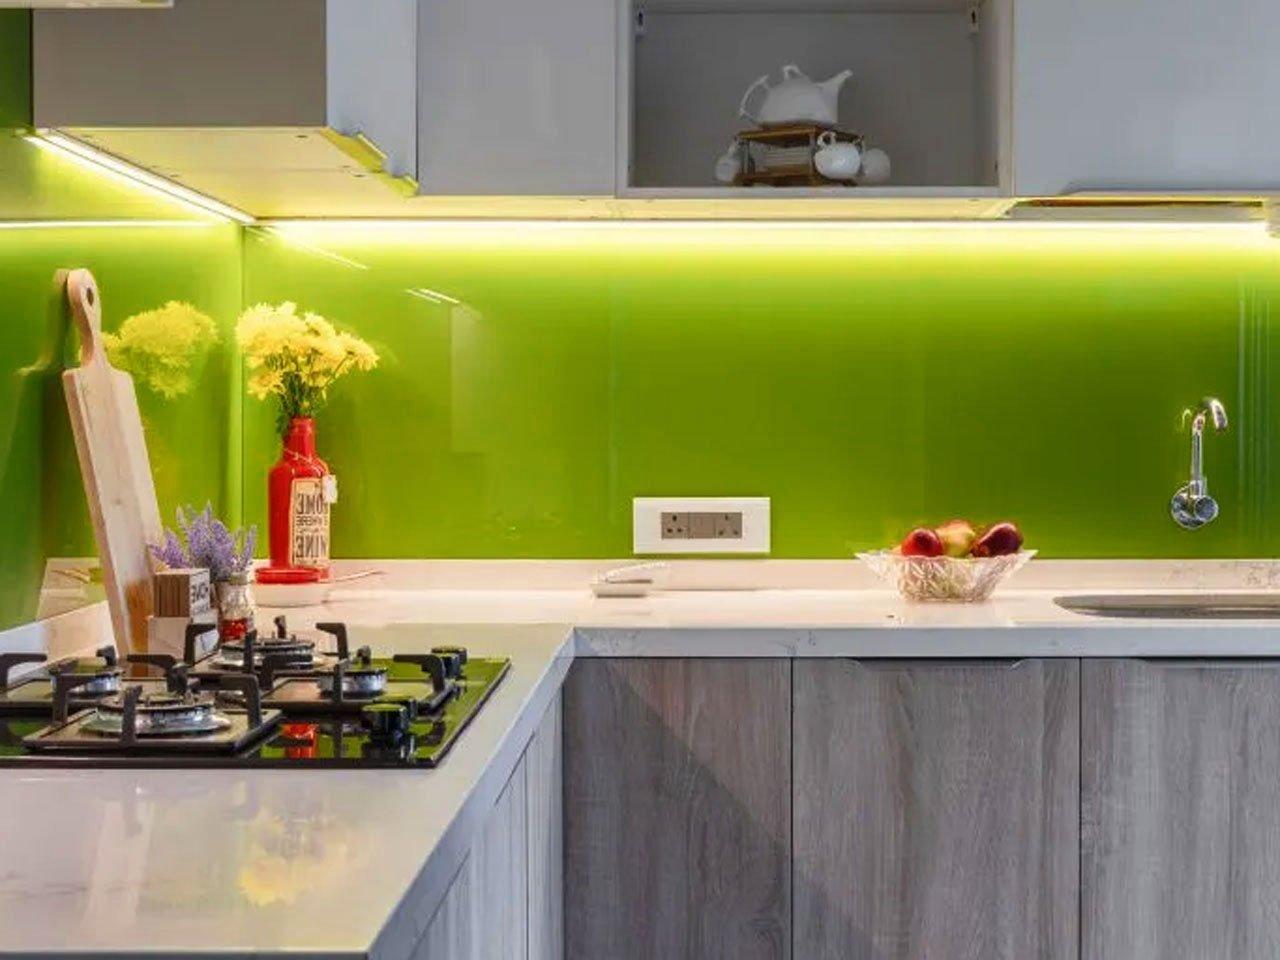 фартук для кухни из стекла с подсветкой скинали фото